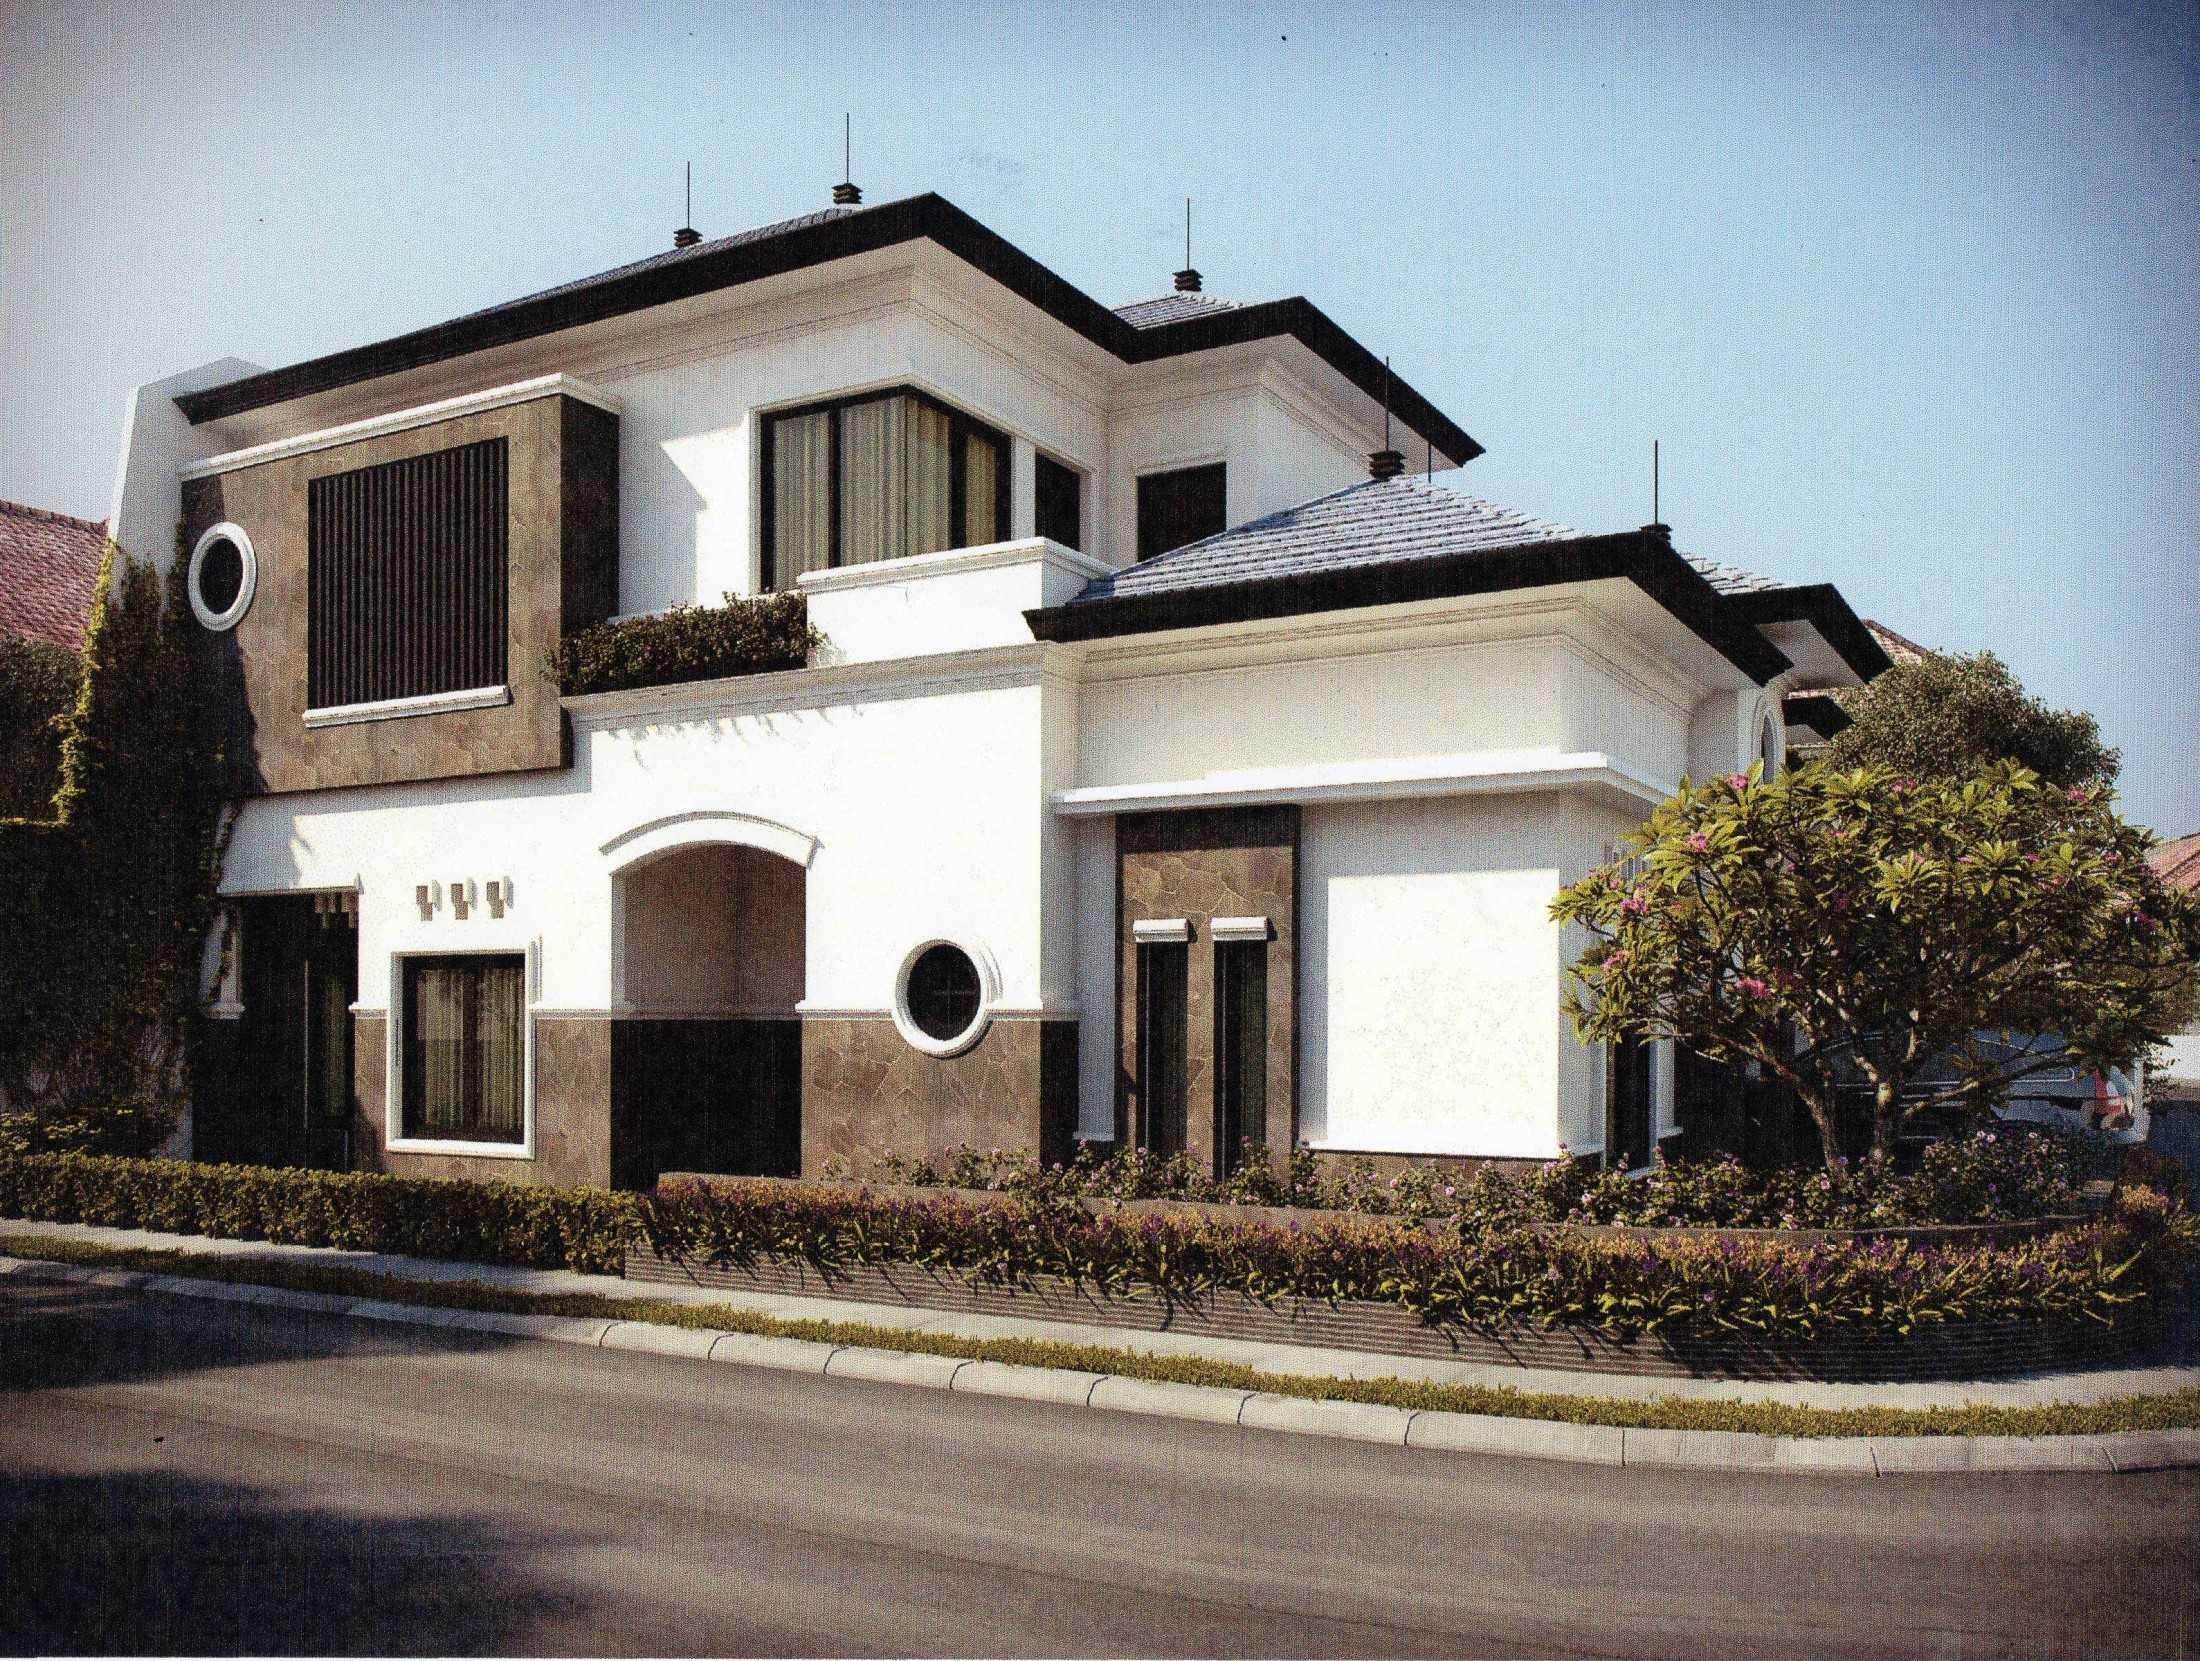 Jasa Design and Build Arisza Housing di Malang